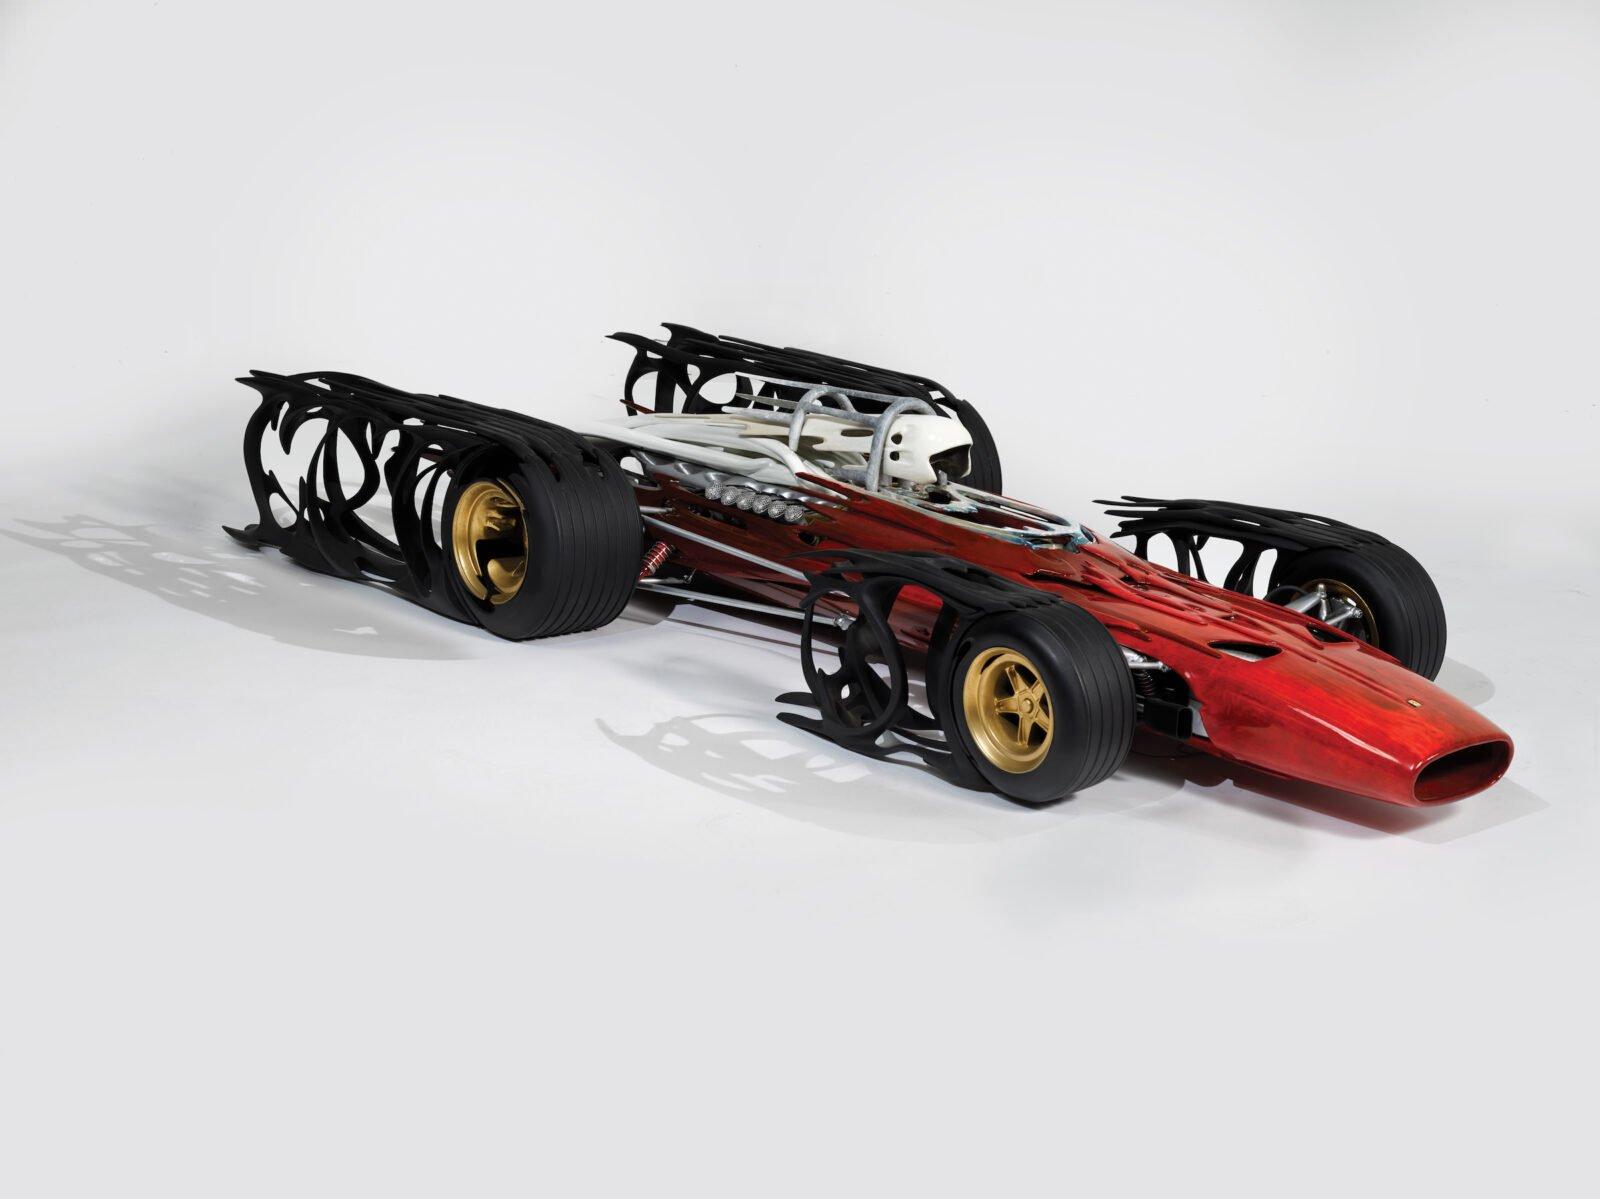 312 Ferrari by Dennis Hoyt 1600x1199 - Ferrari 312 by Dennis Hoyt